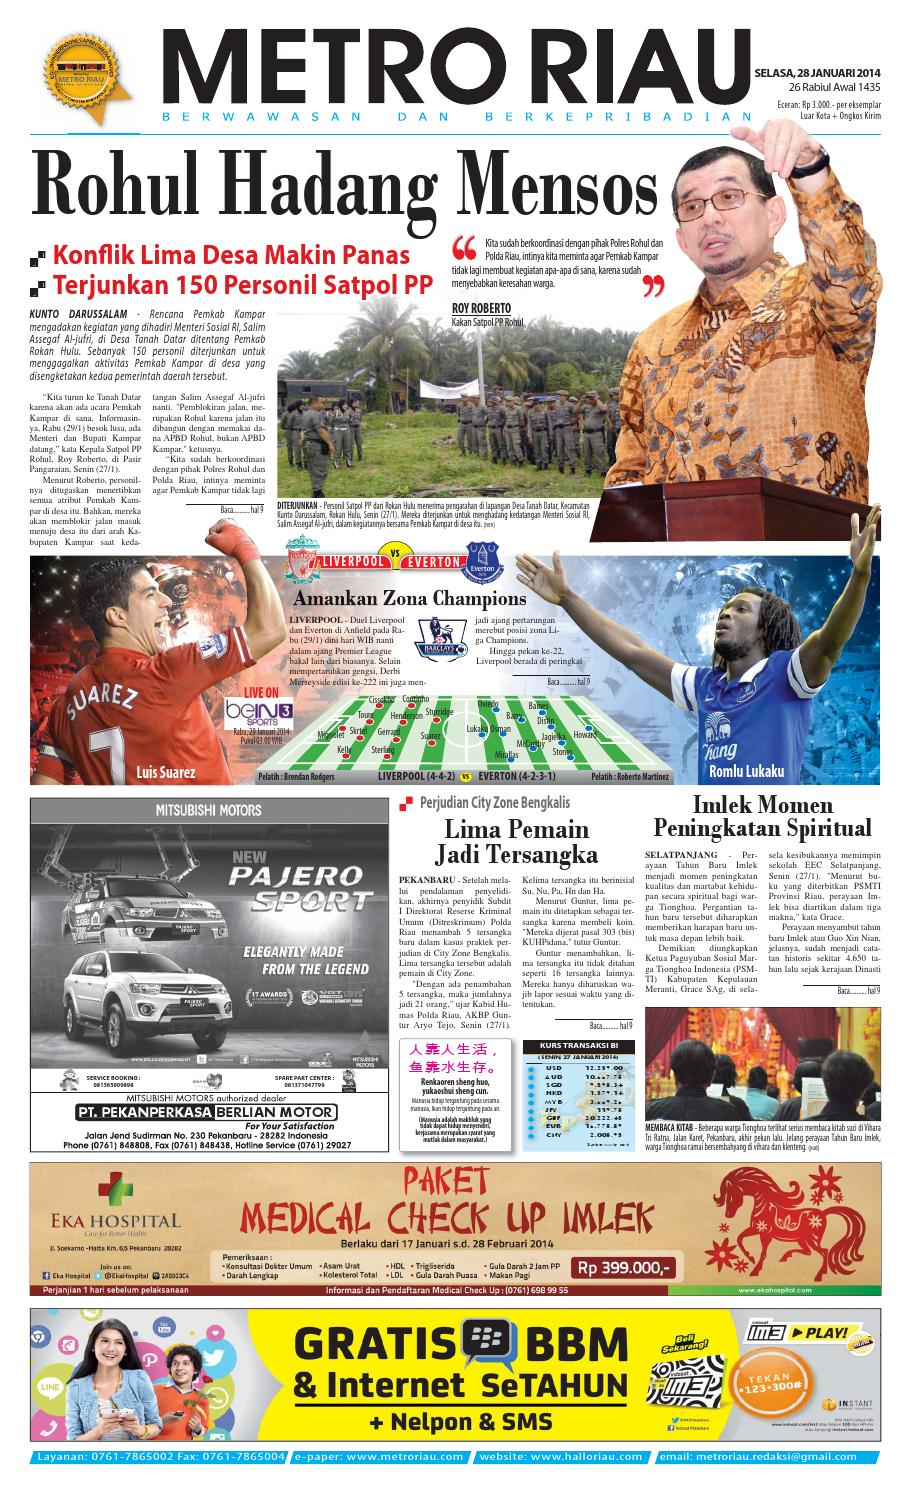 280114 By Harian Pagi Metro Riau Issuu Produk Ukm Bumn Rasa Dewa Sari Buah Mbing 250ml Jus Free Ongkir Depok Ampamp Jakarta